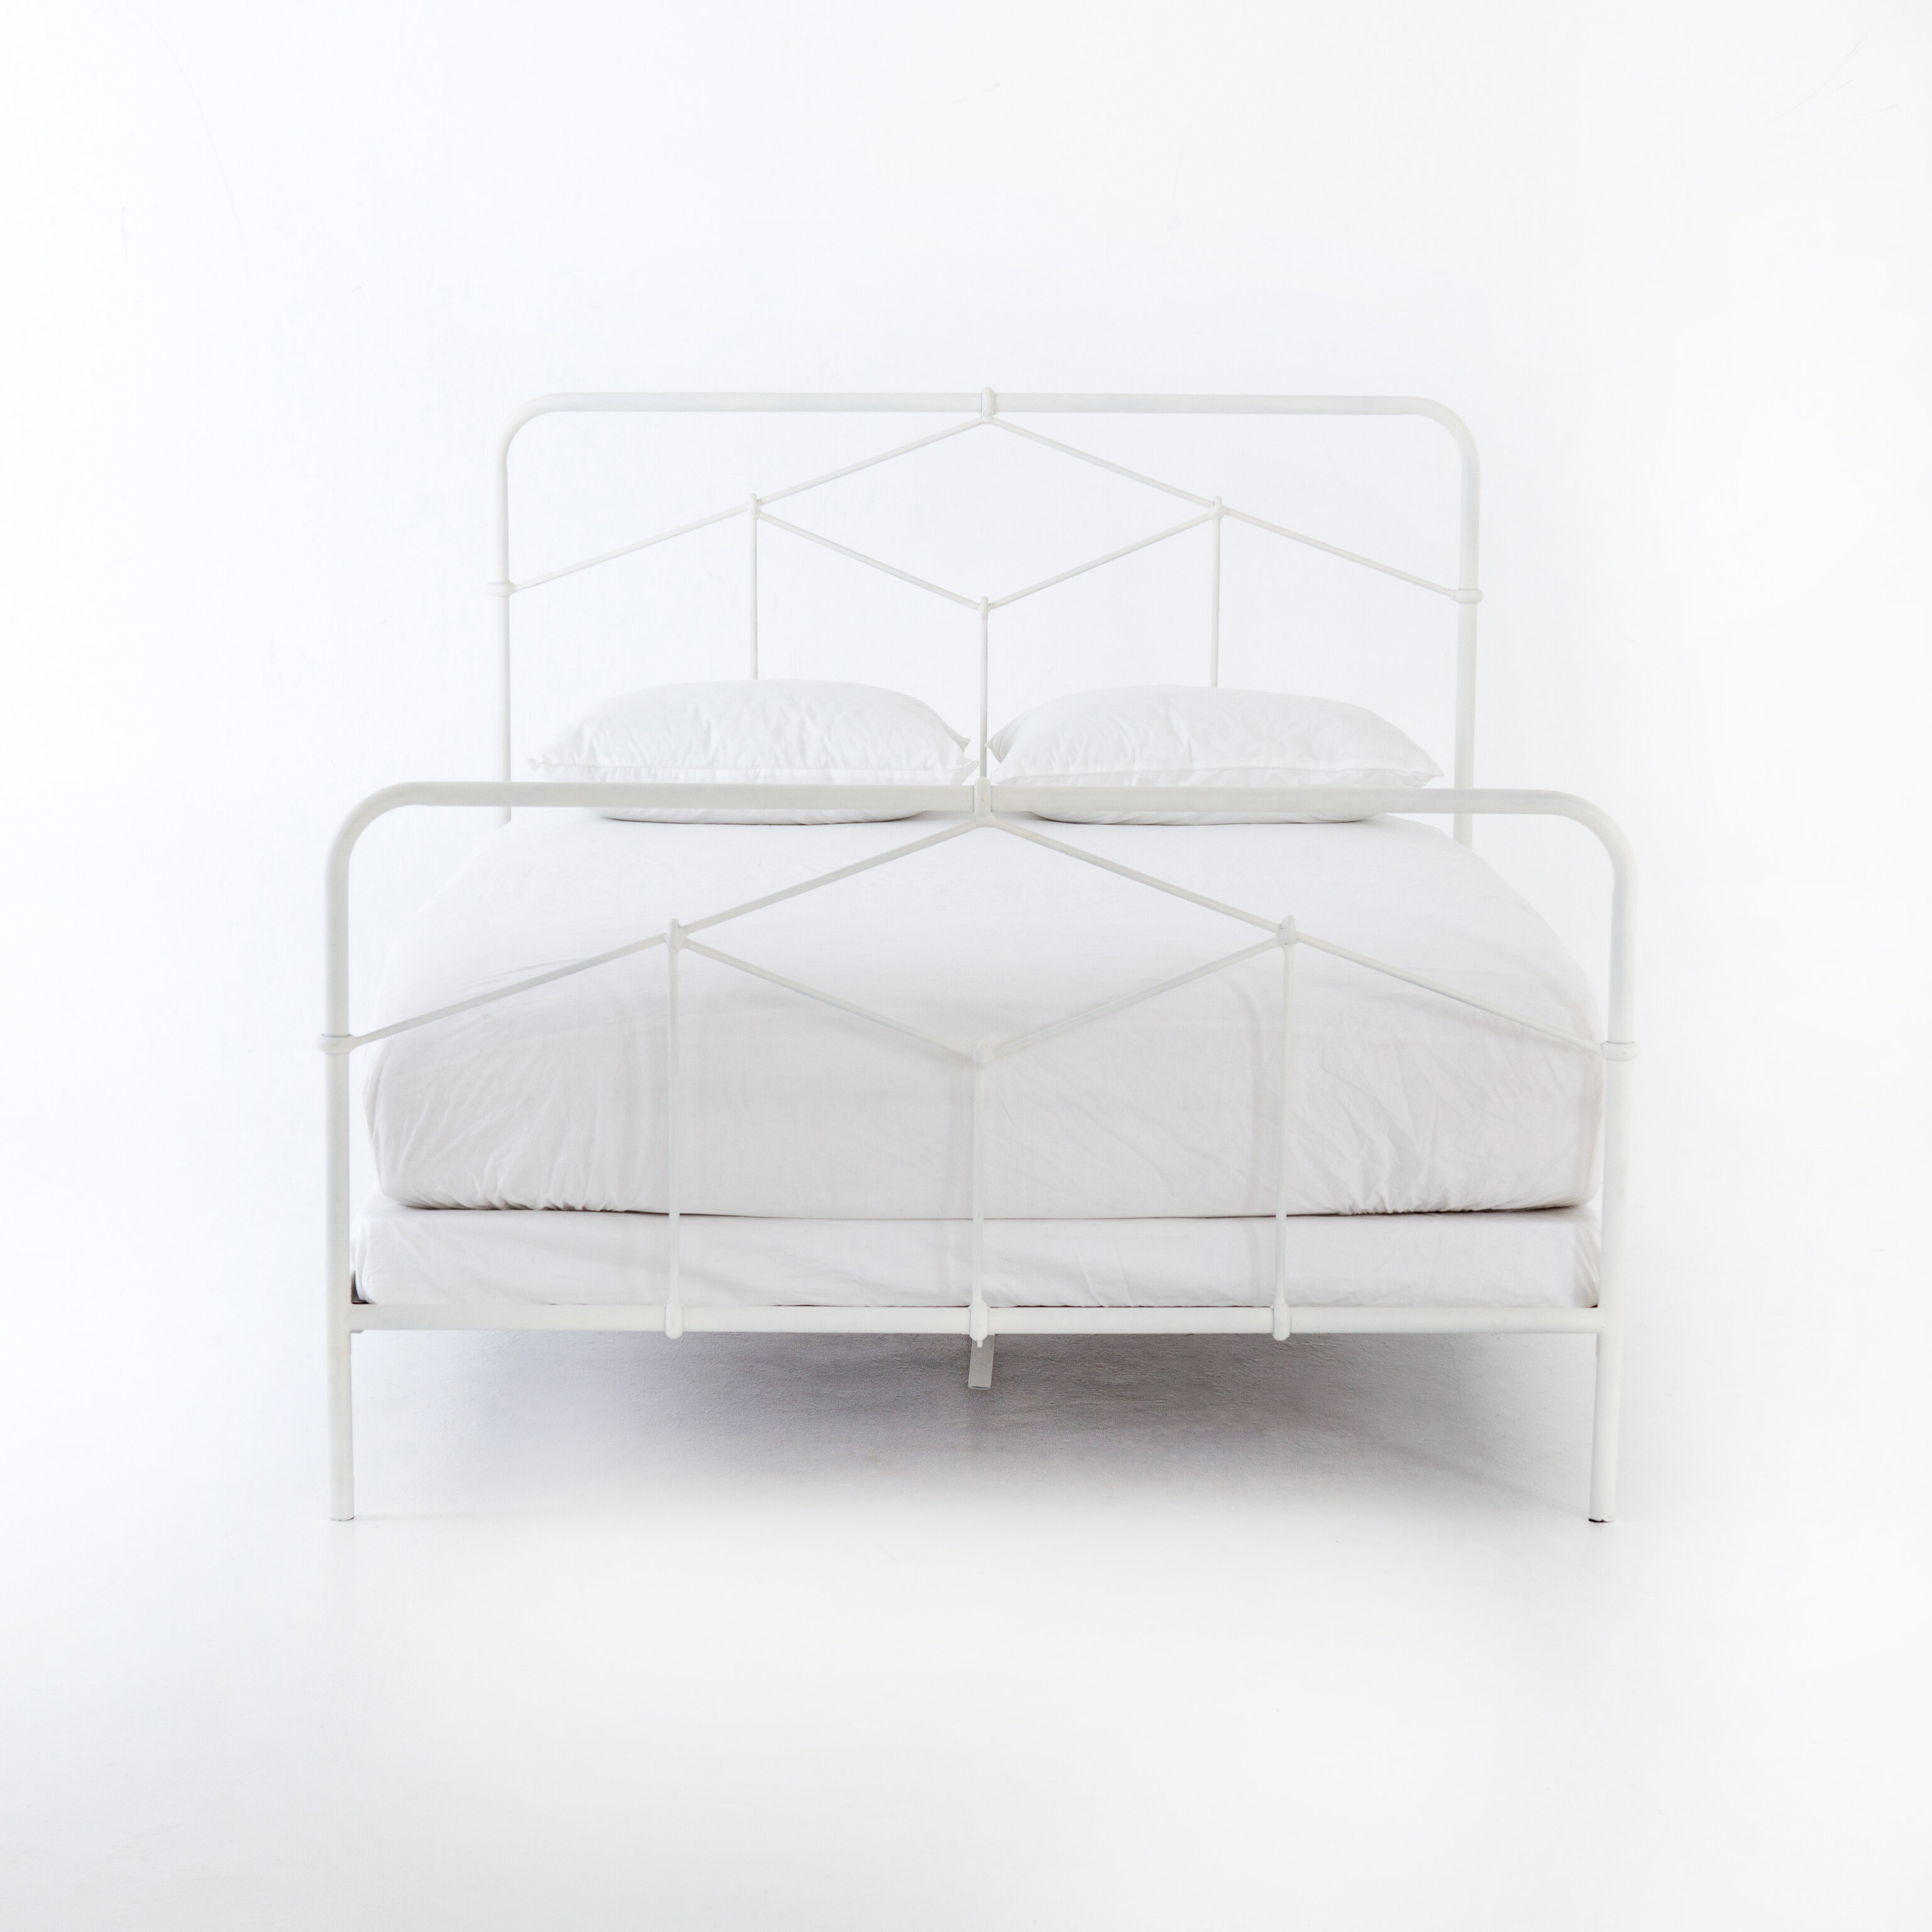 Picture of: Gracie Oaks Felder Iron Bed Wayfair